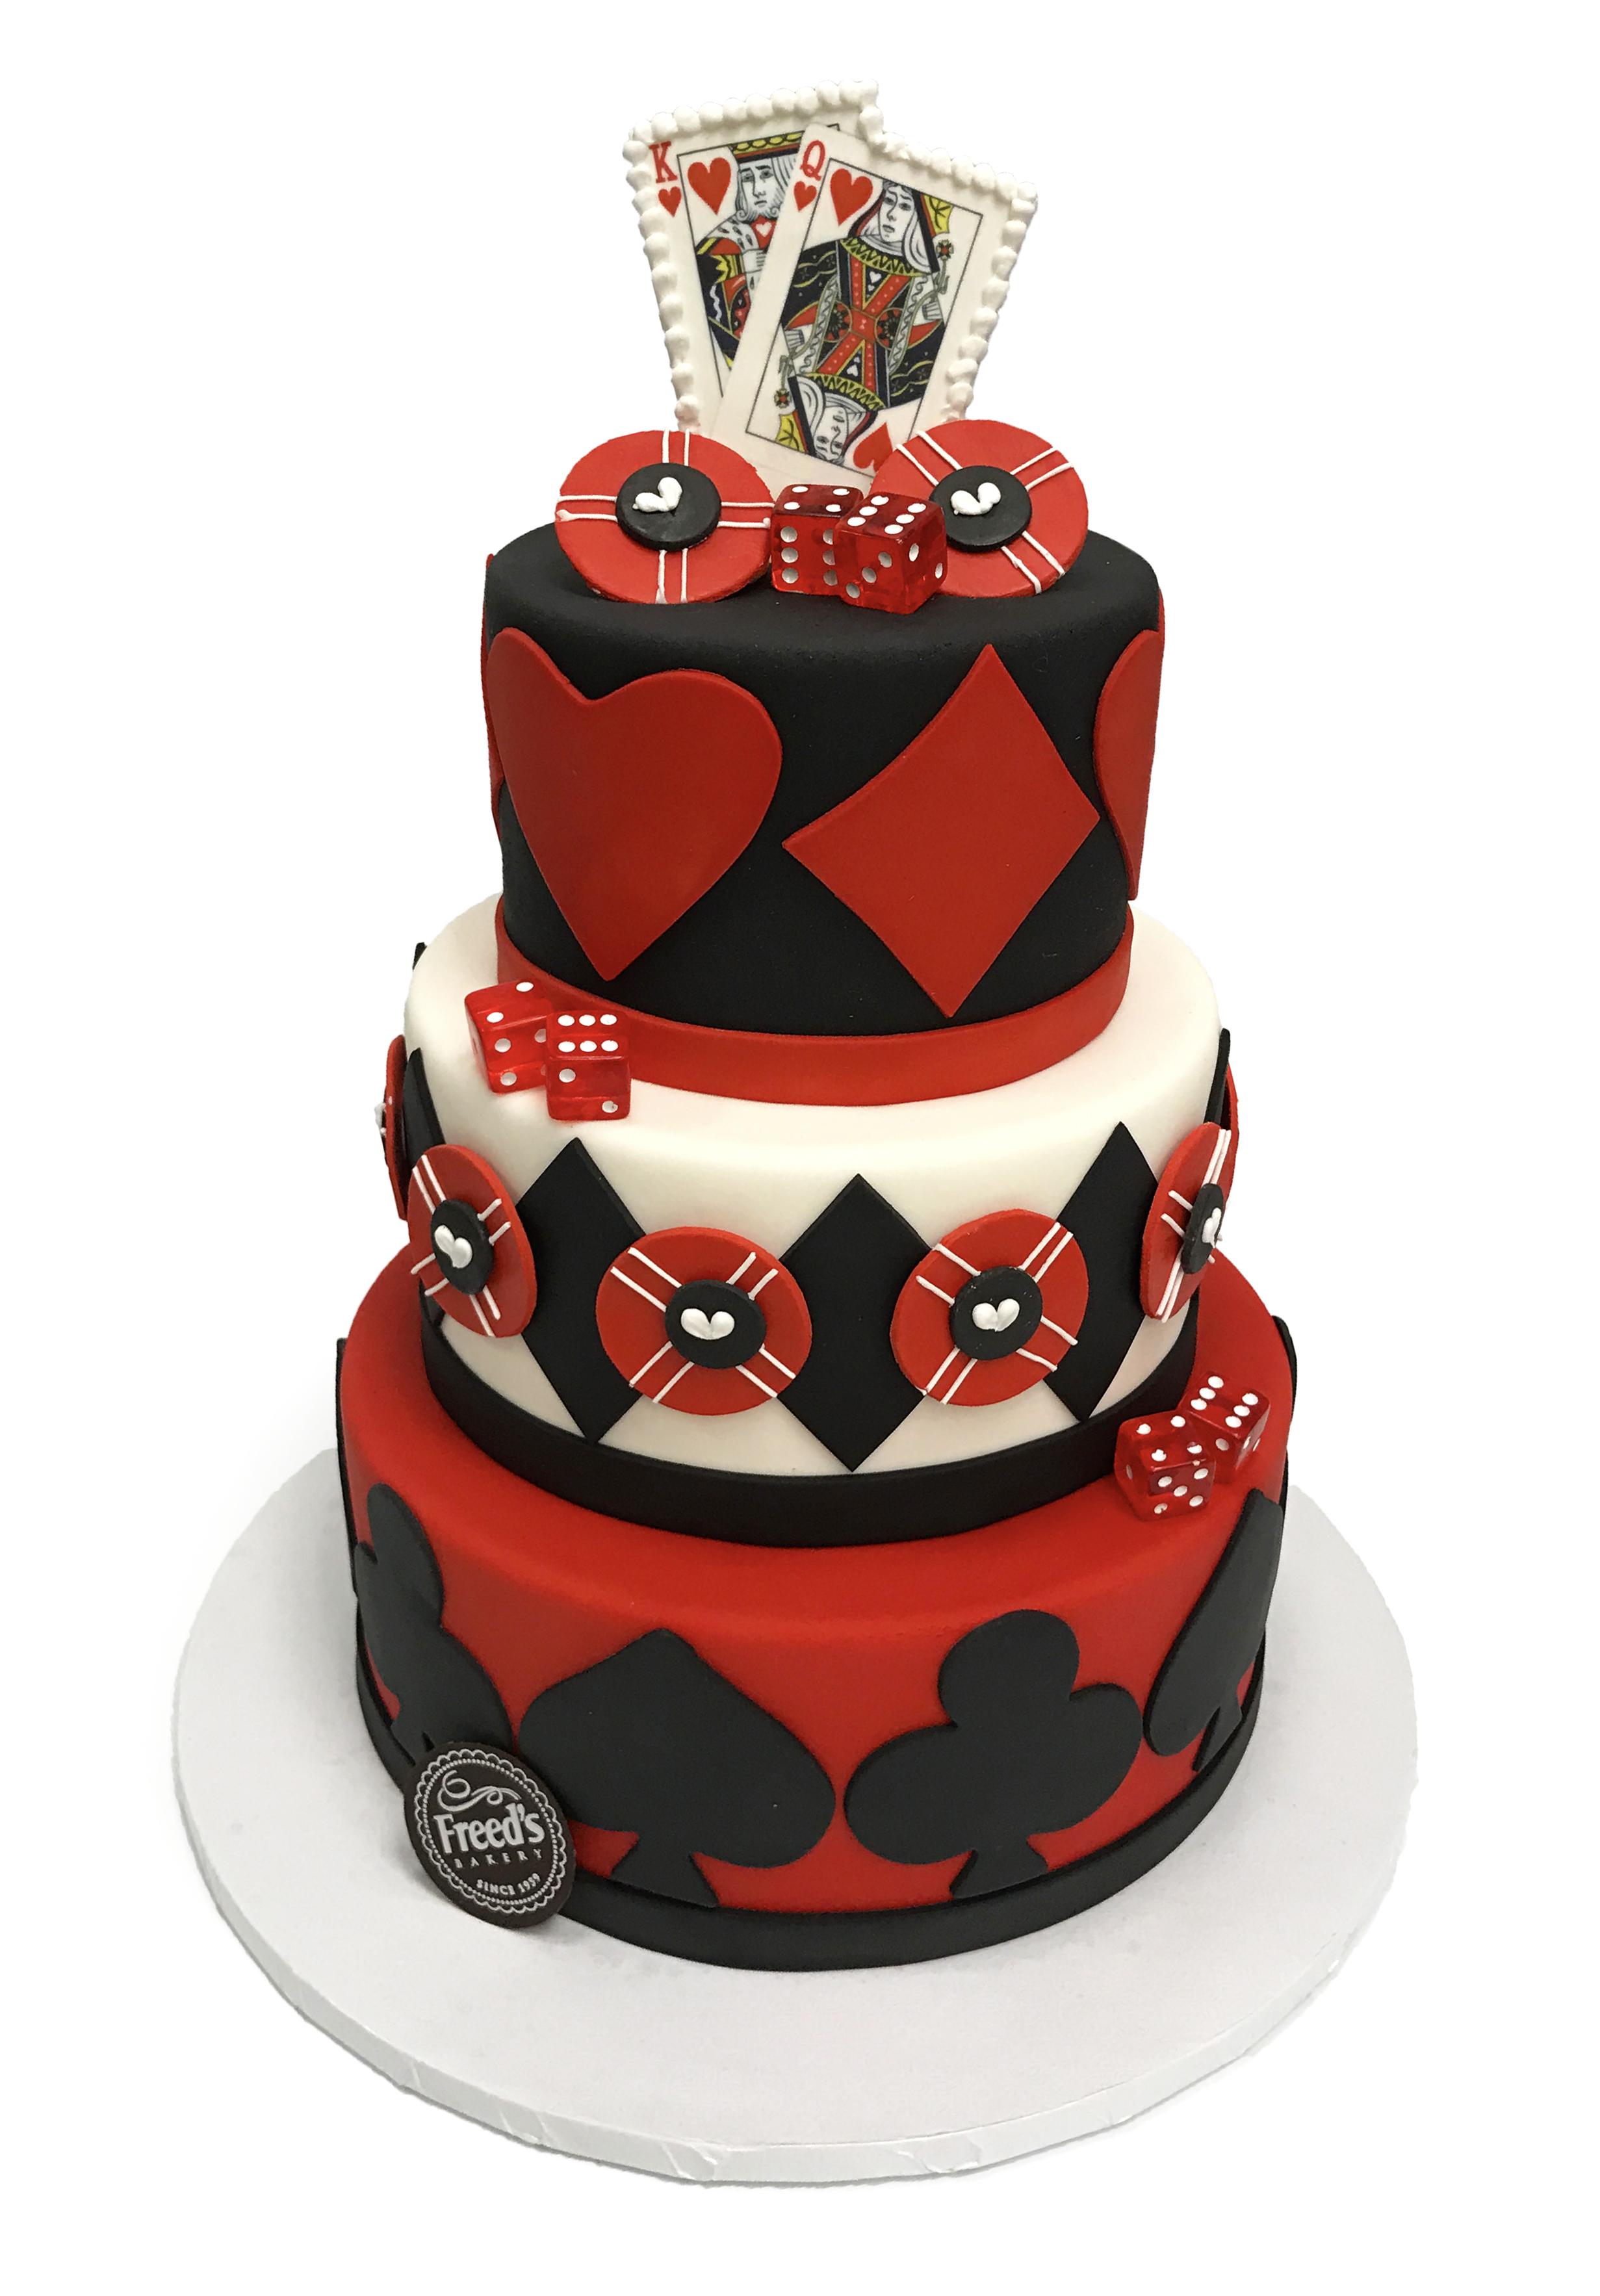 Birthday Cake Delivery In Las Vegas Nv Birthday Cake Delivery Las